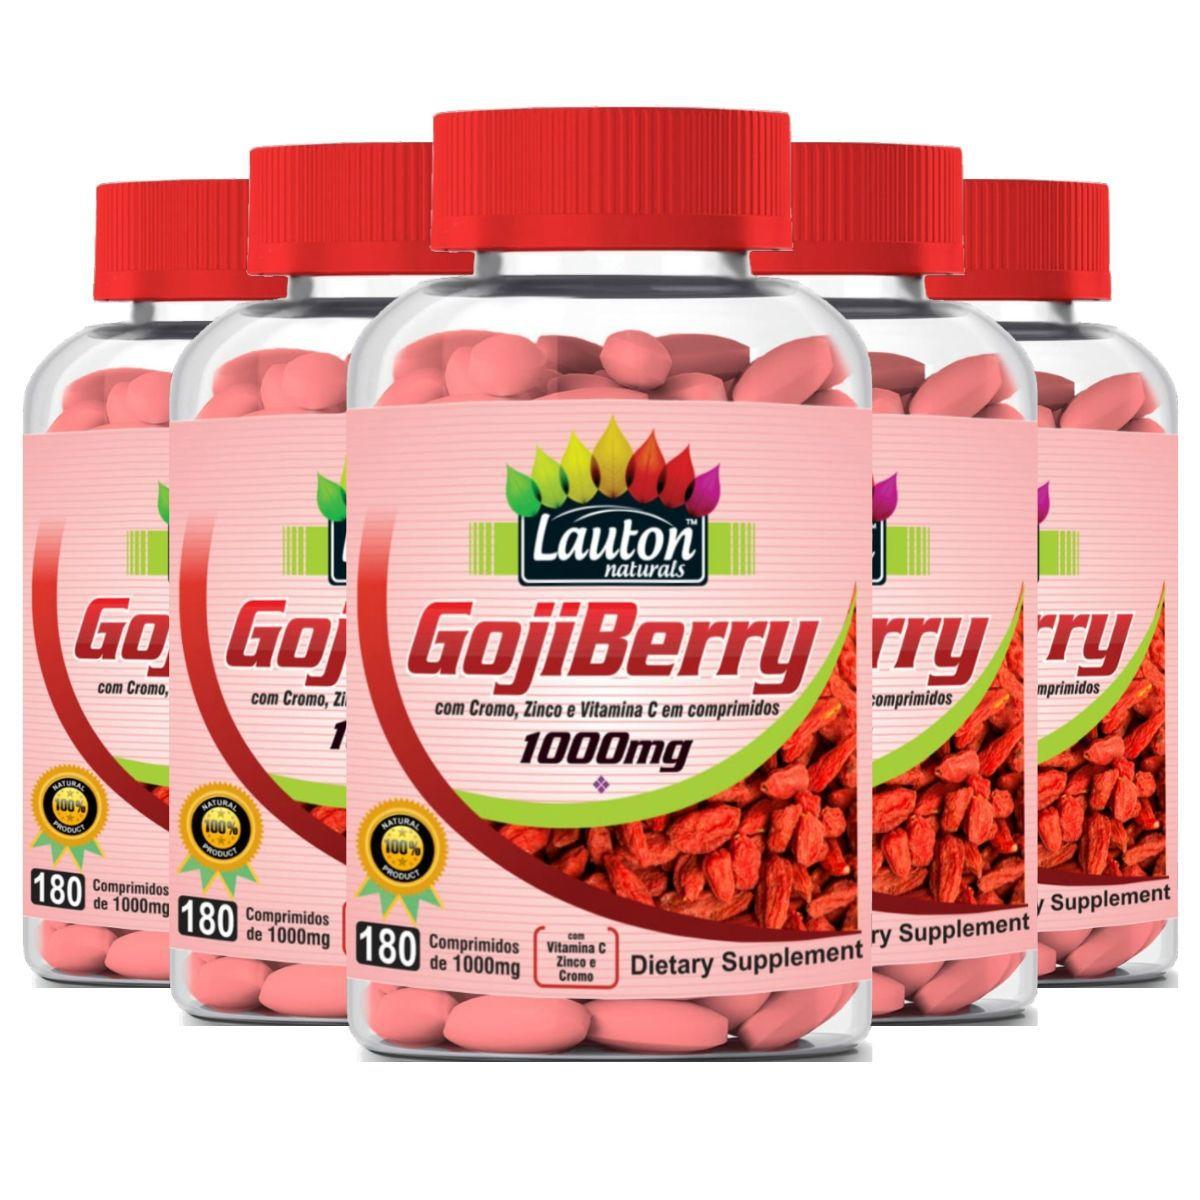 Kit 5 Goji Berry Lauton Nutrition 180 Comprimidos 1000mg